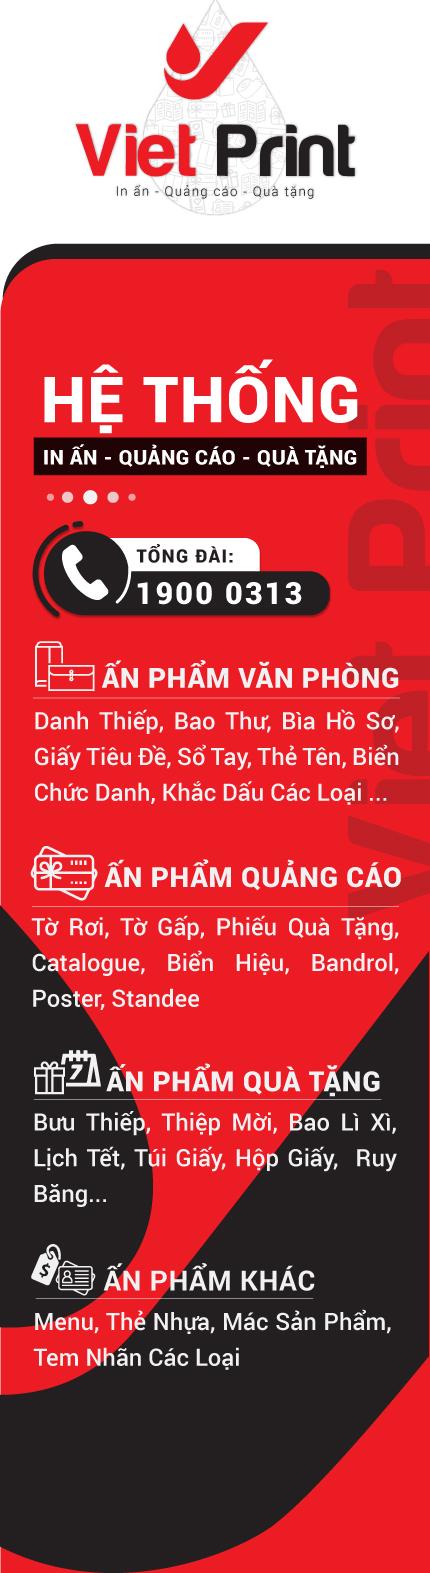 Quảng cáo Viet Print